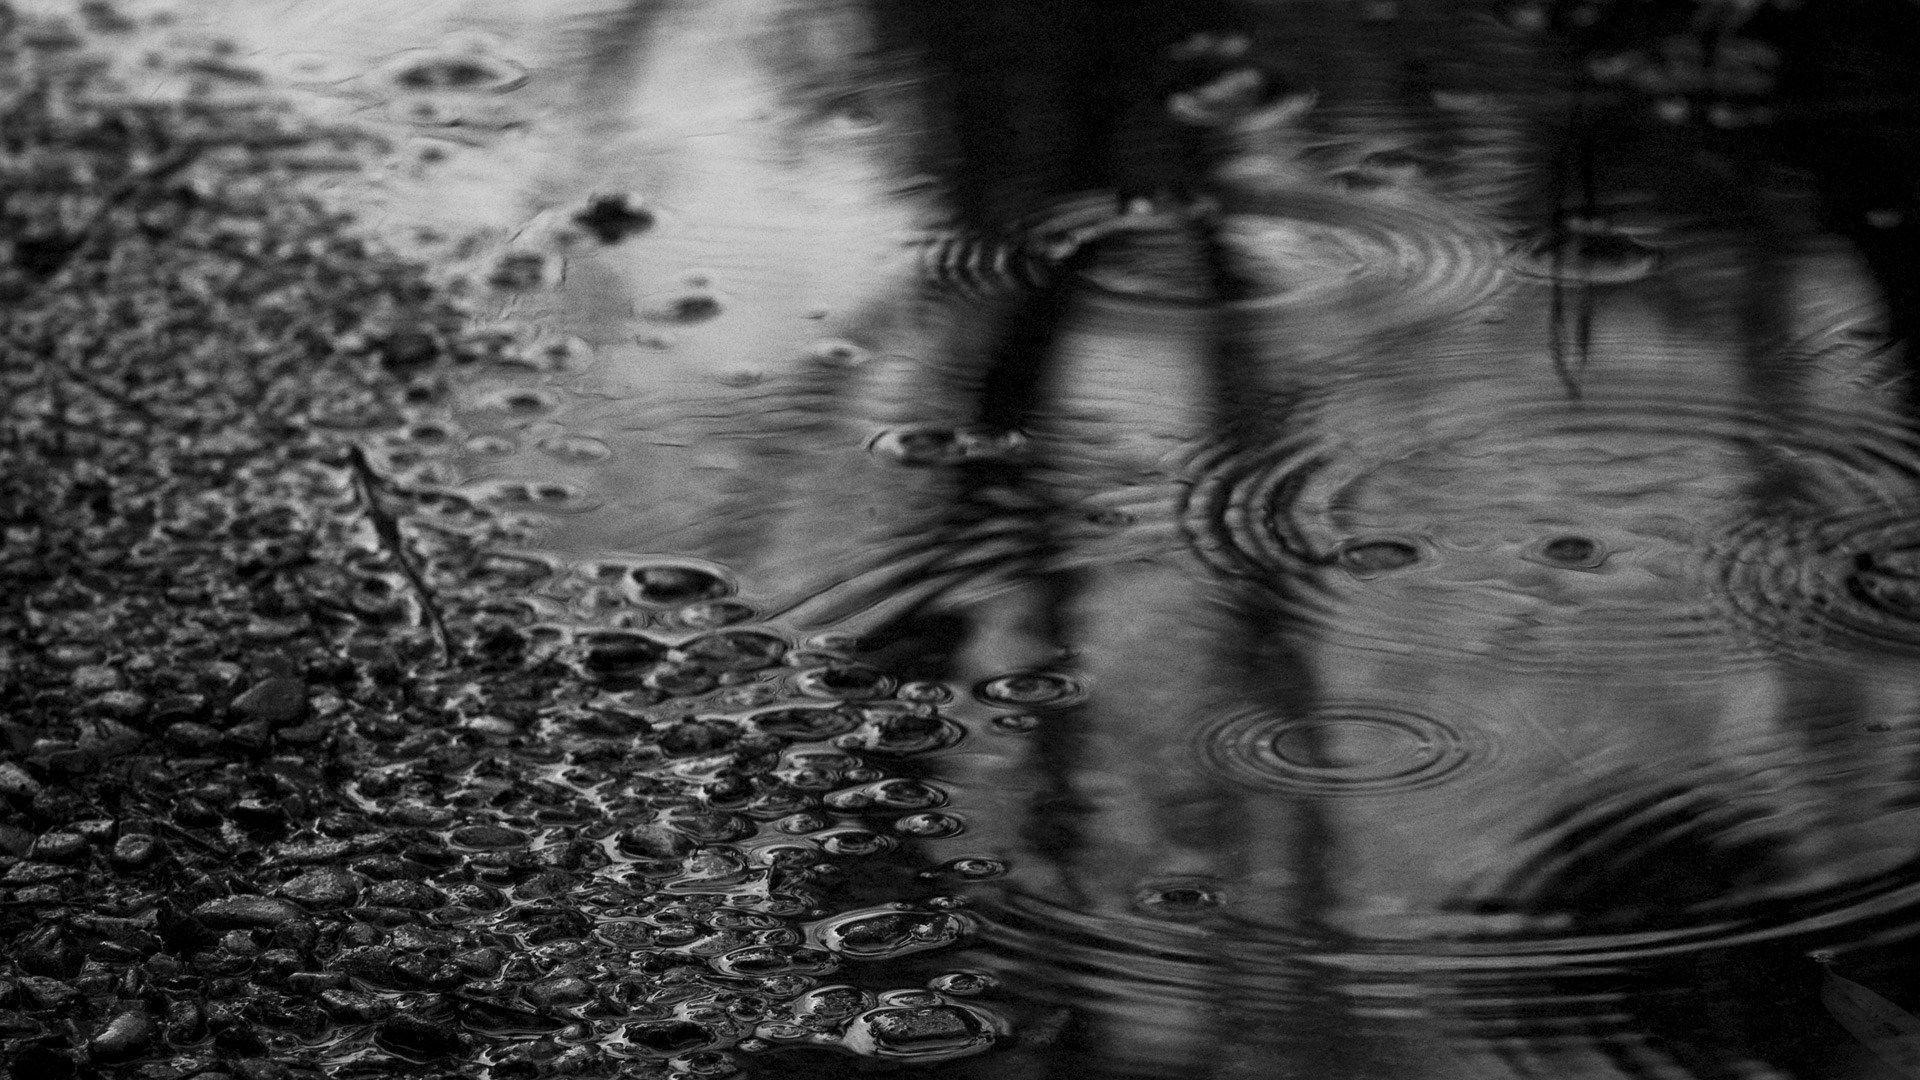 Hd wallpaper rain - Rain Hd Wallpapers 1080p Windows